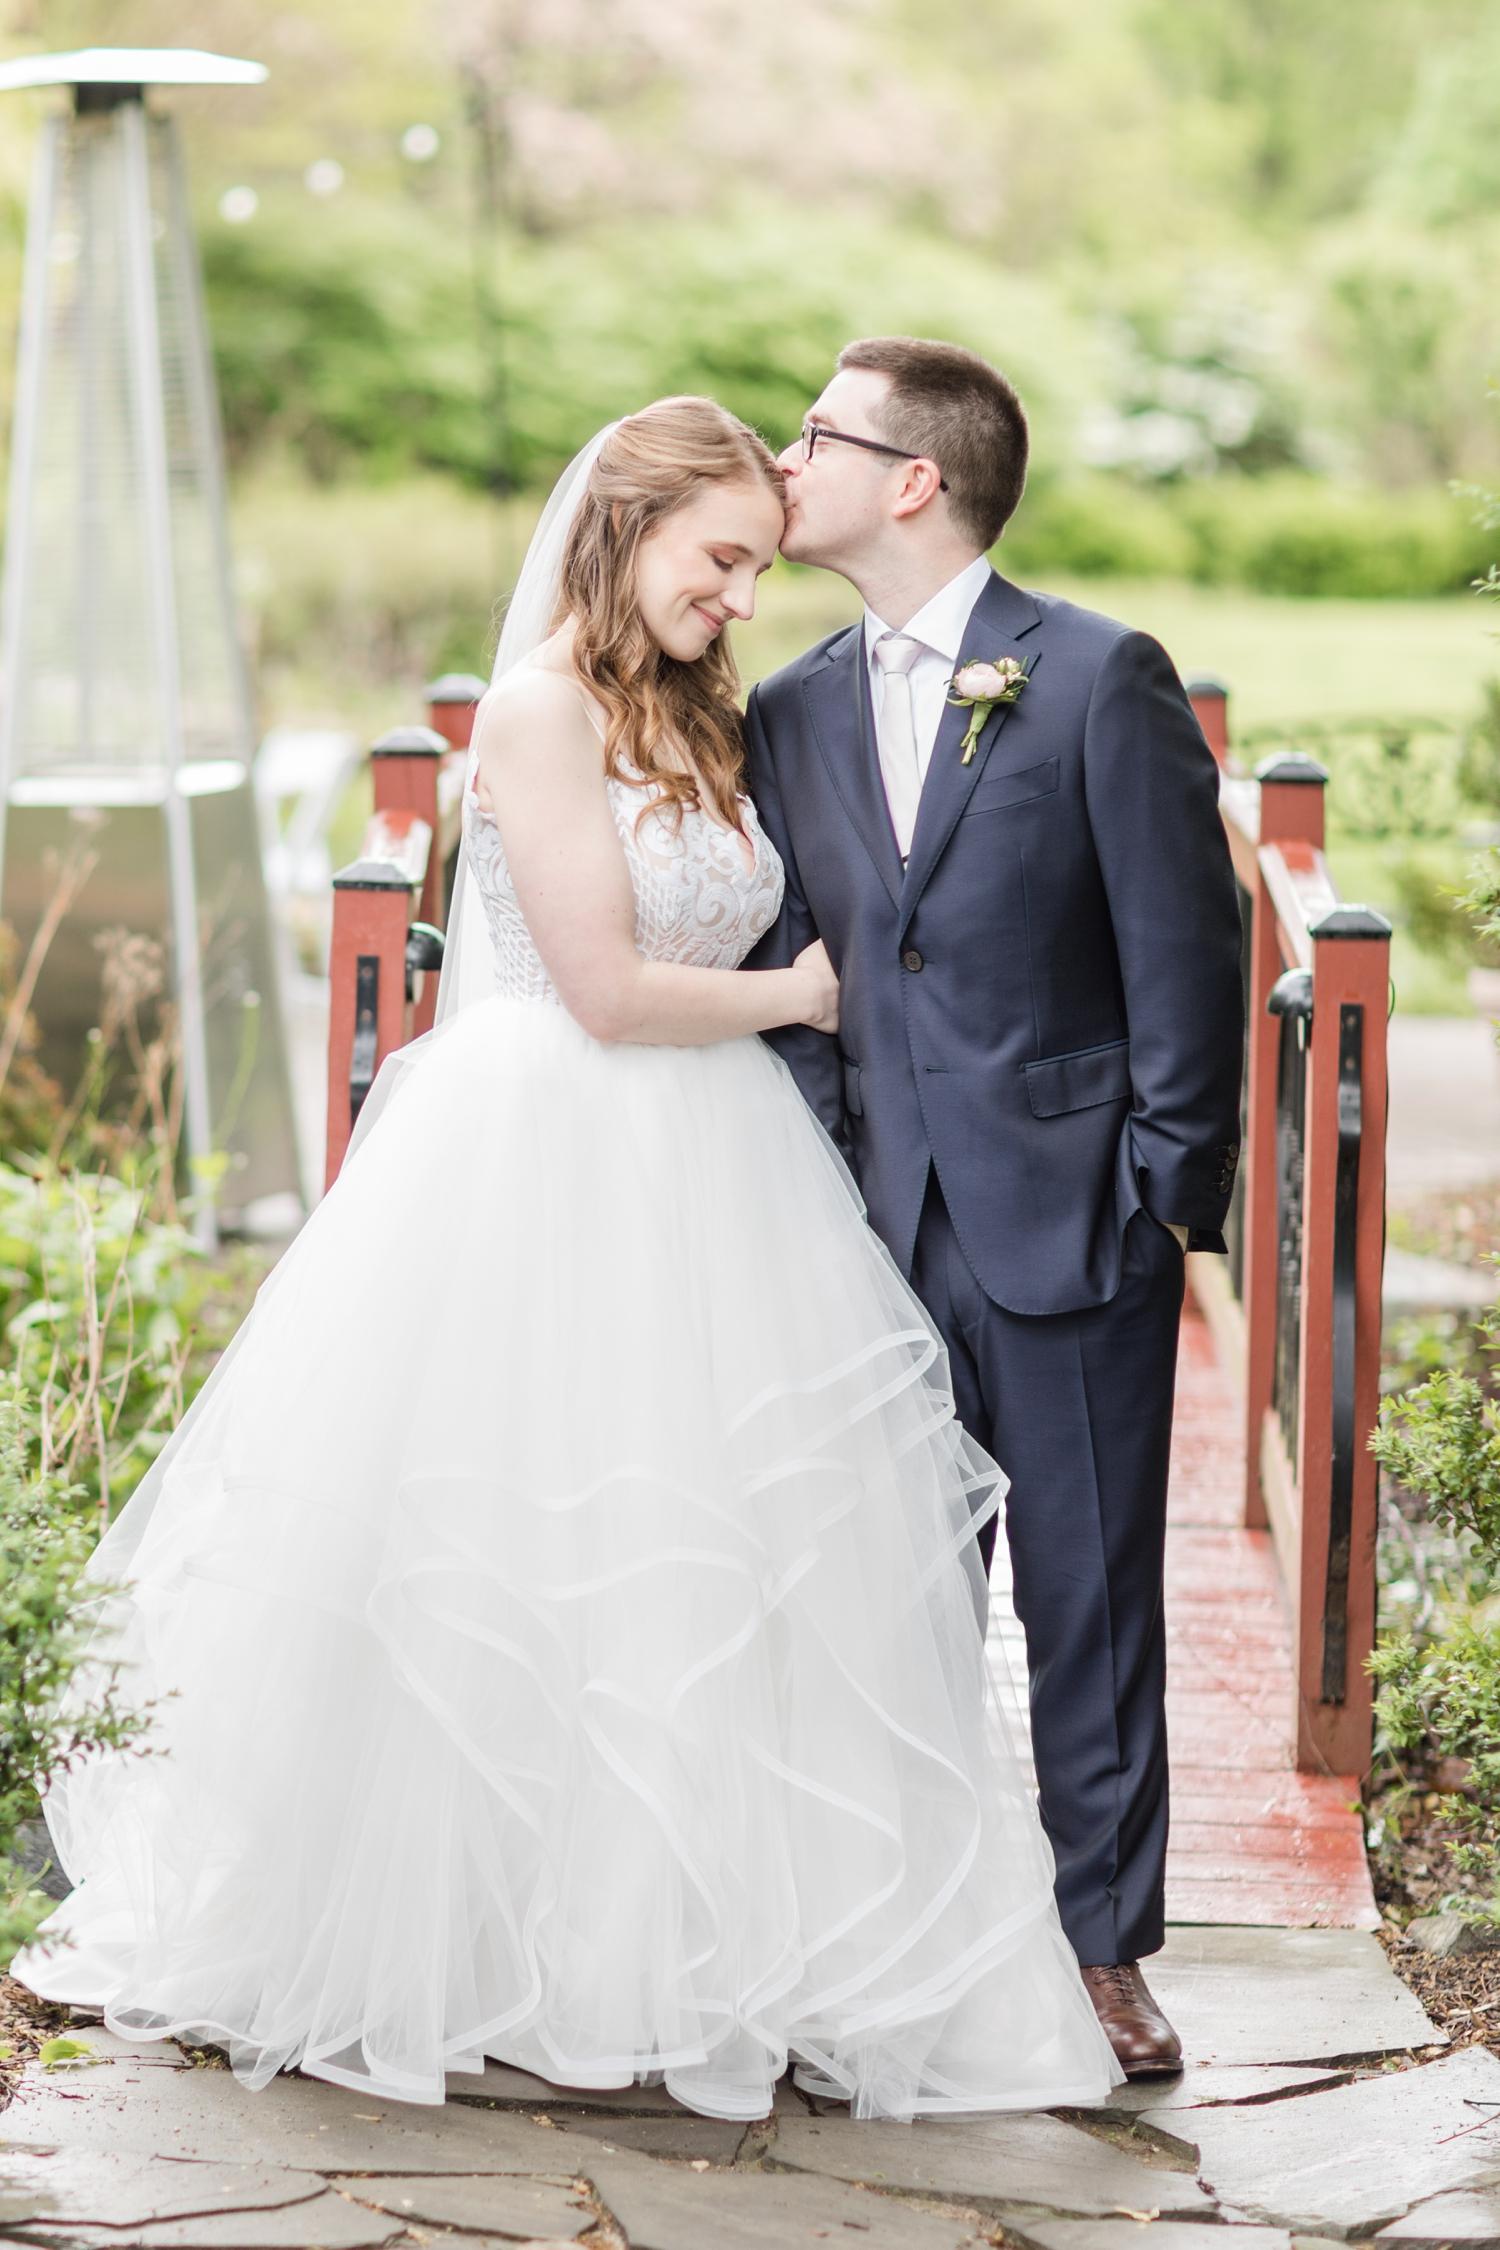 Hildebrand WEDDING HIGHLIGHTS-97_Elkridge-Furnace-Inn-wedding-Maryland-wedding-photographer-anna-grace-photography-photo.jpg